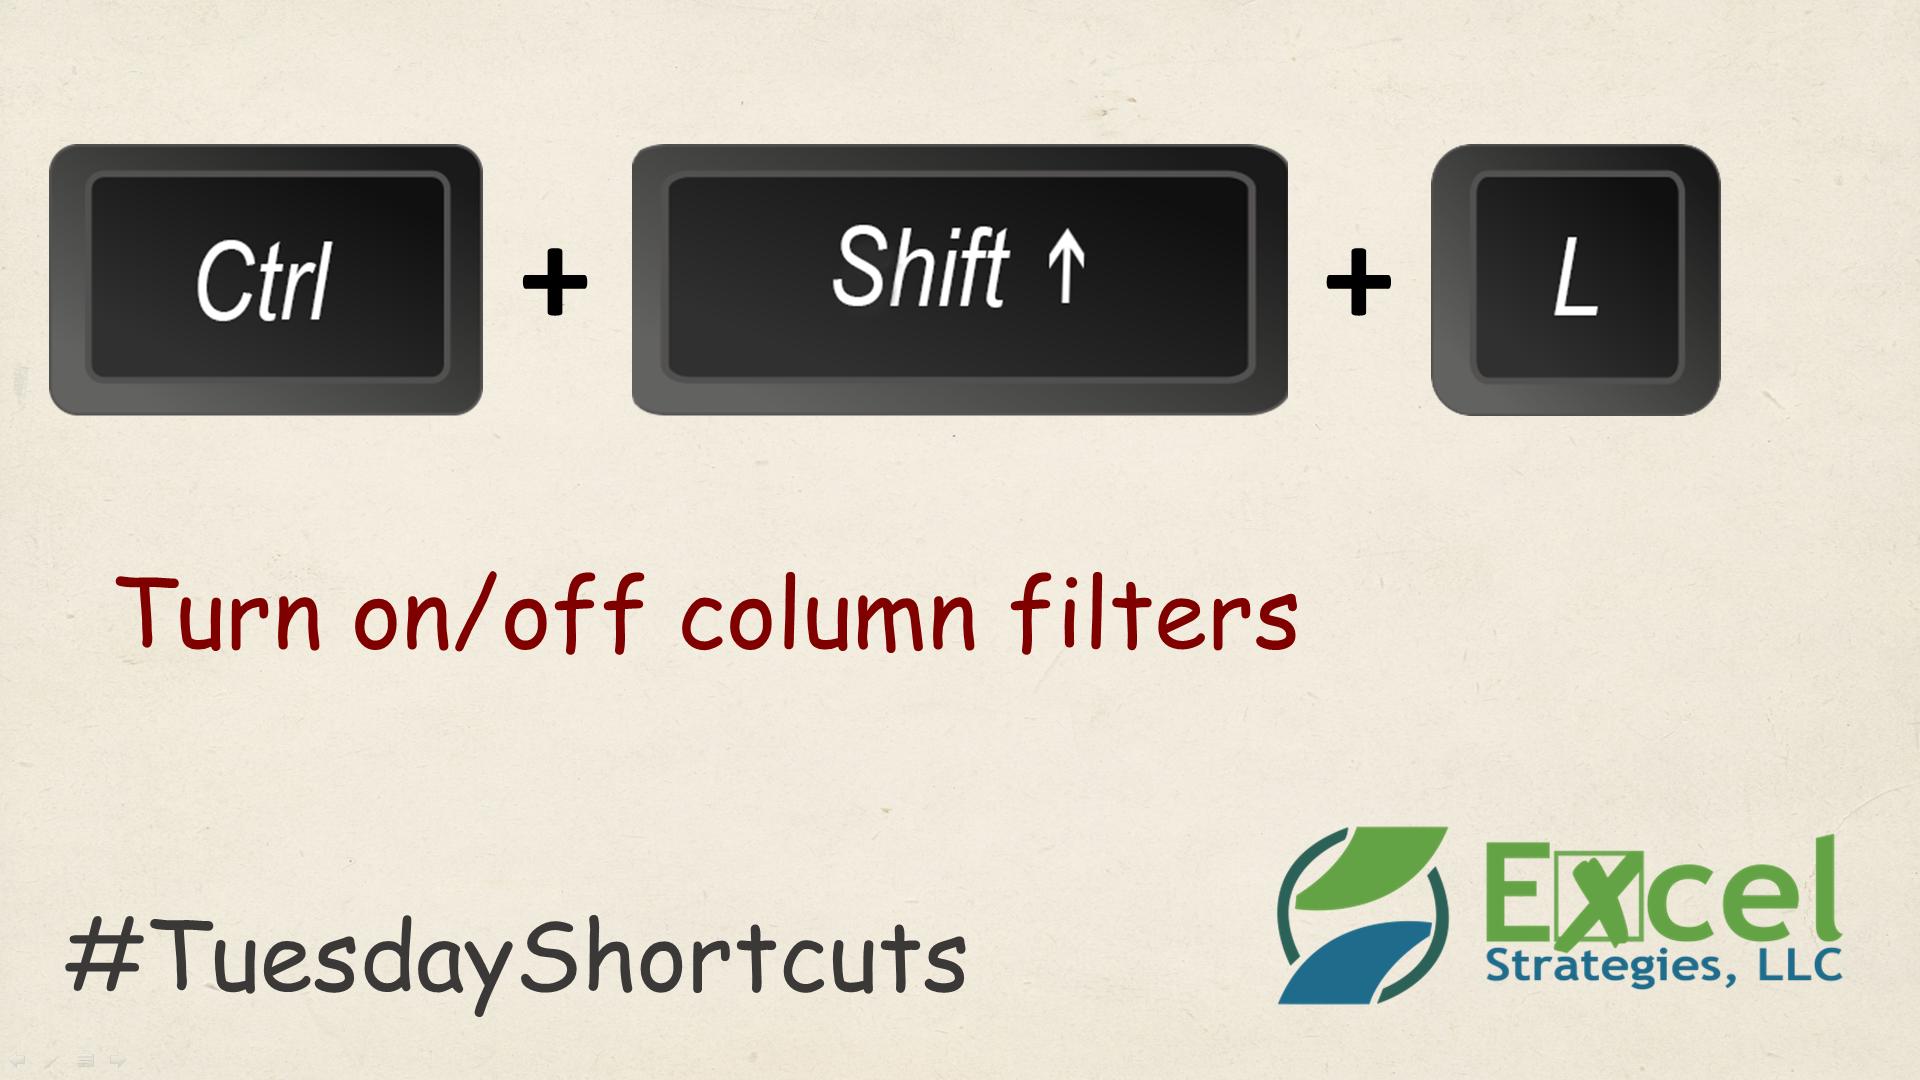 CTRL + Shift + L Apply/turn off column filters in